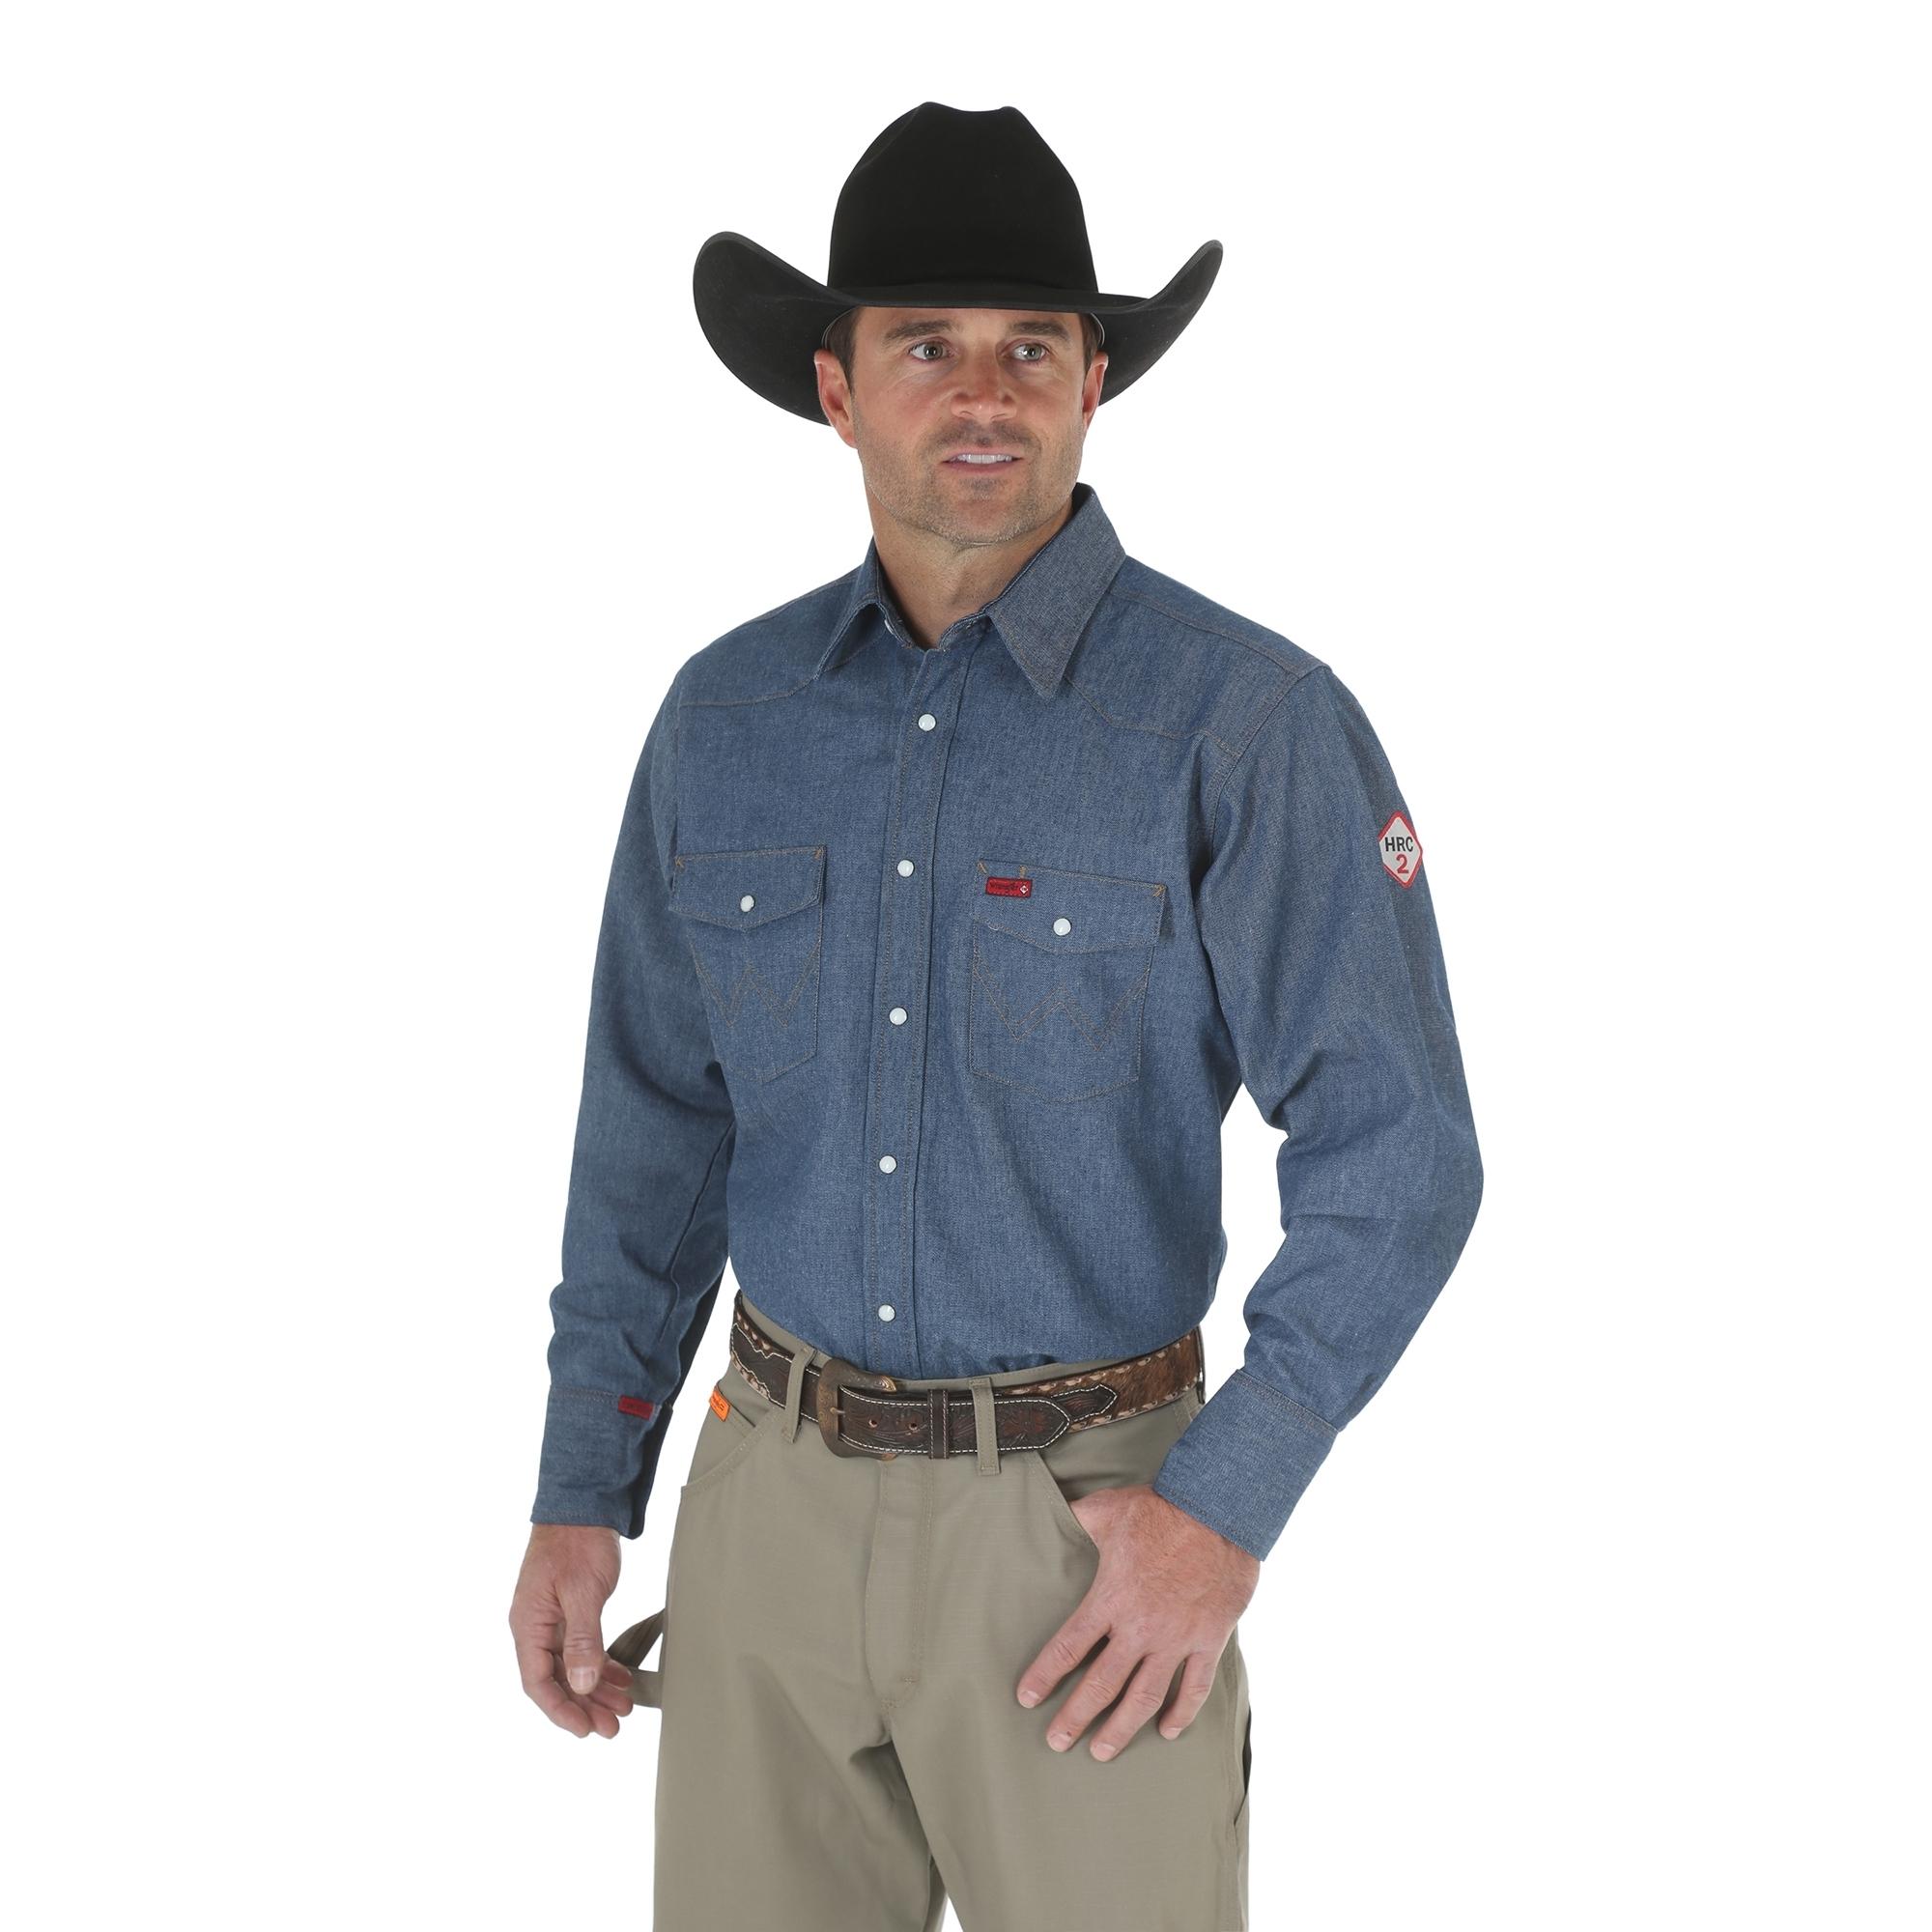 Wrangler denim fire retardant work shirt fr12127 for Flame resistant work shirts